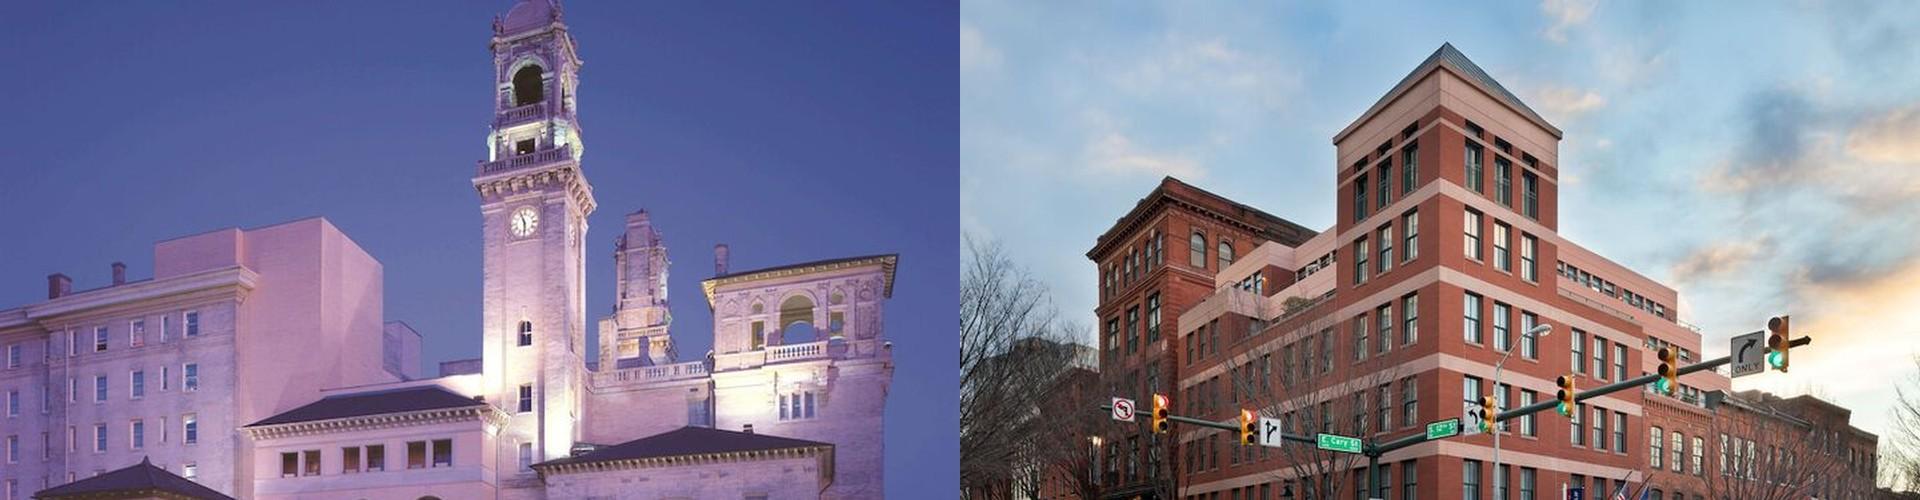 Decorating Red Door Spa Richmond Pictures Inspiring Photos